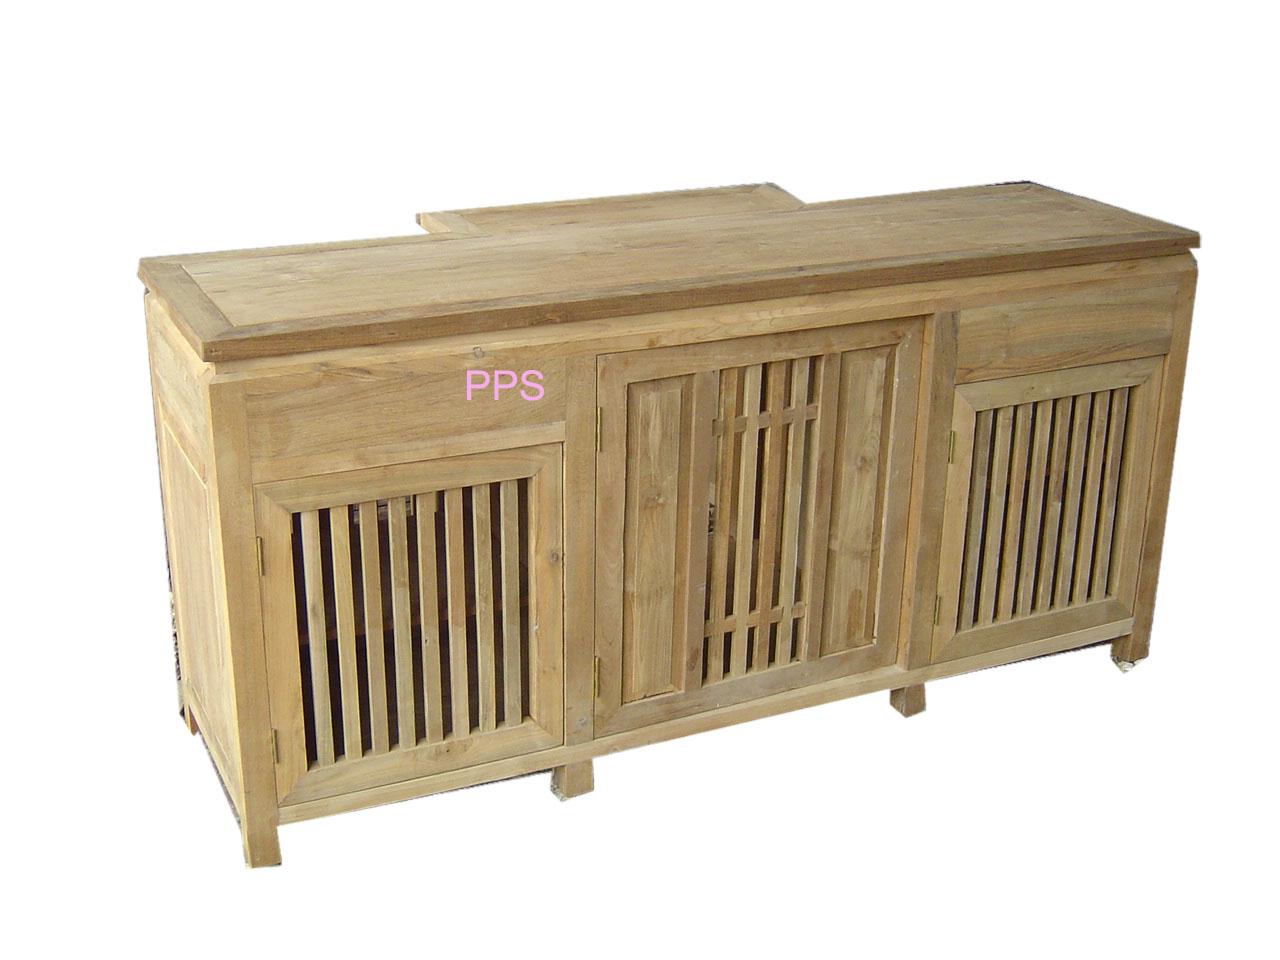 PS-Wood Shelf (sn345-1)